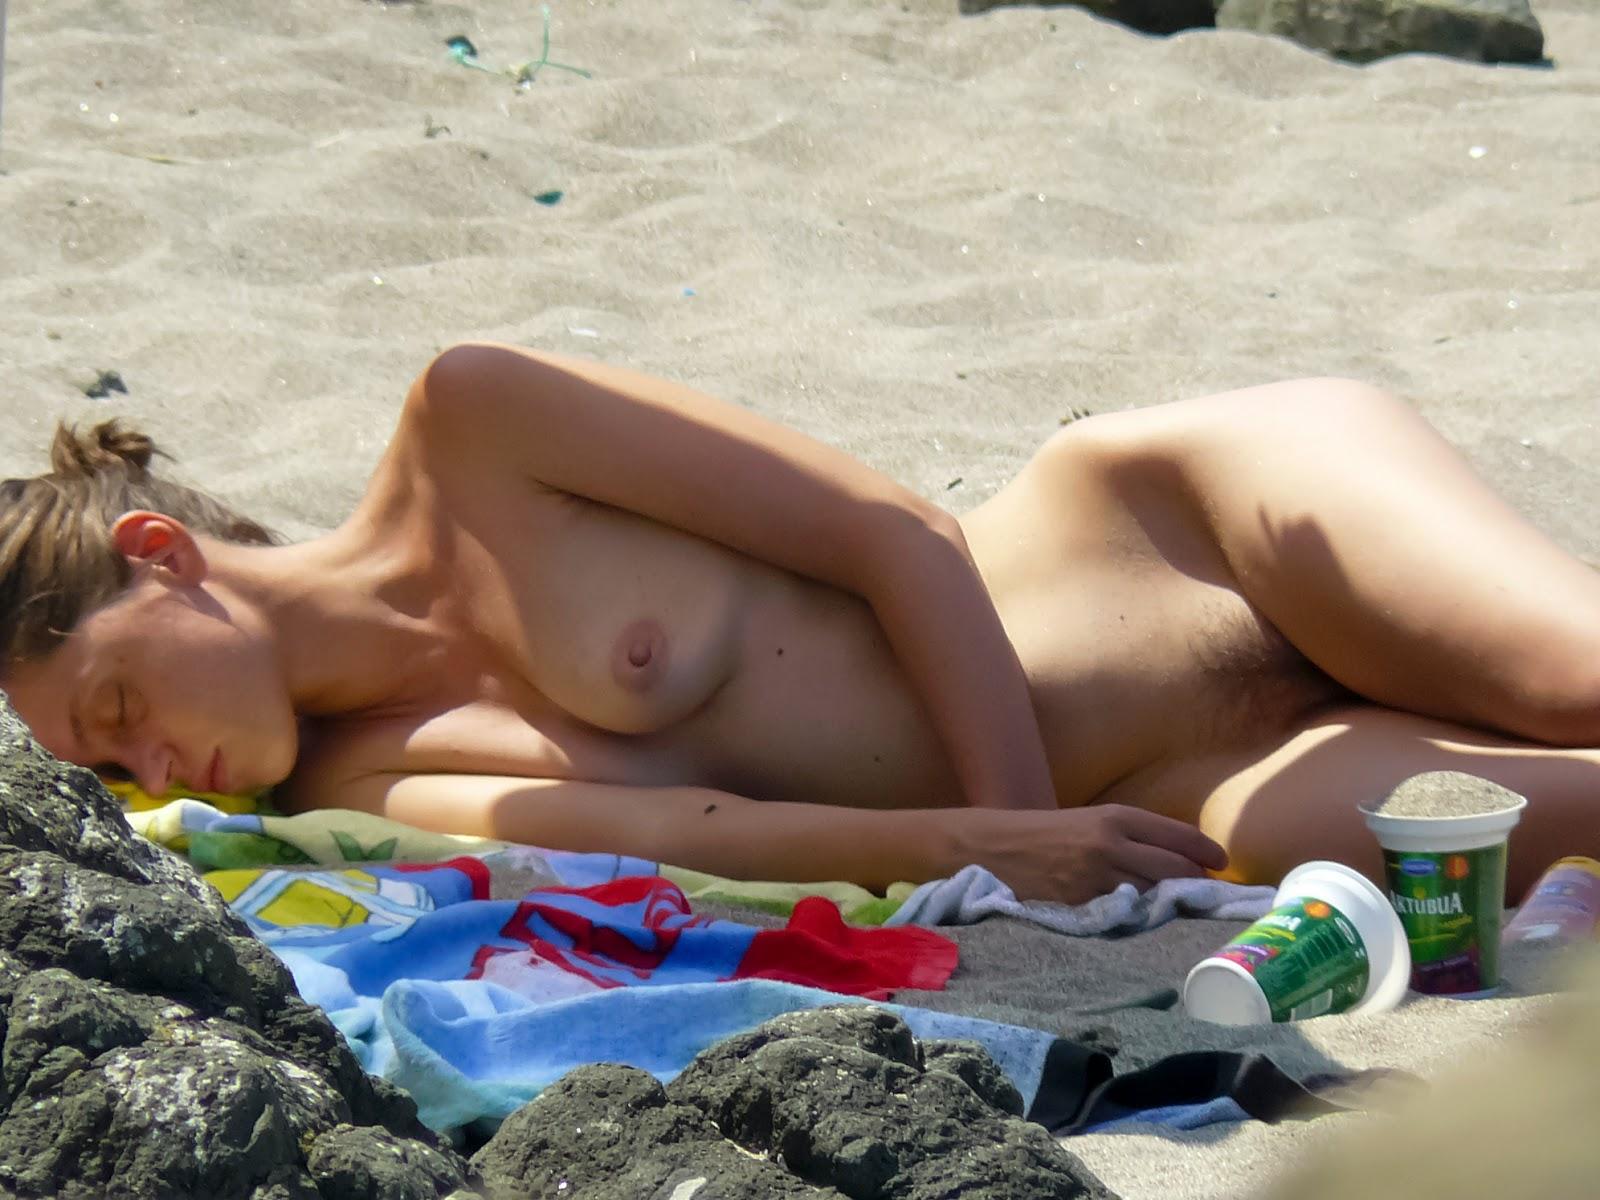 Nudist Resort Pictures Hq